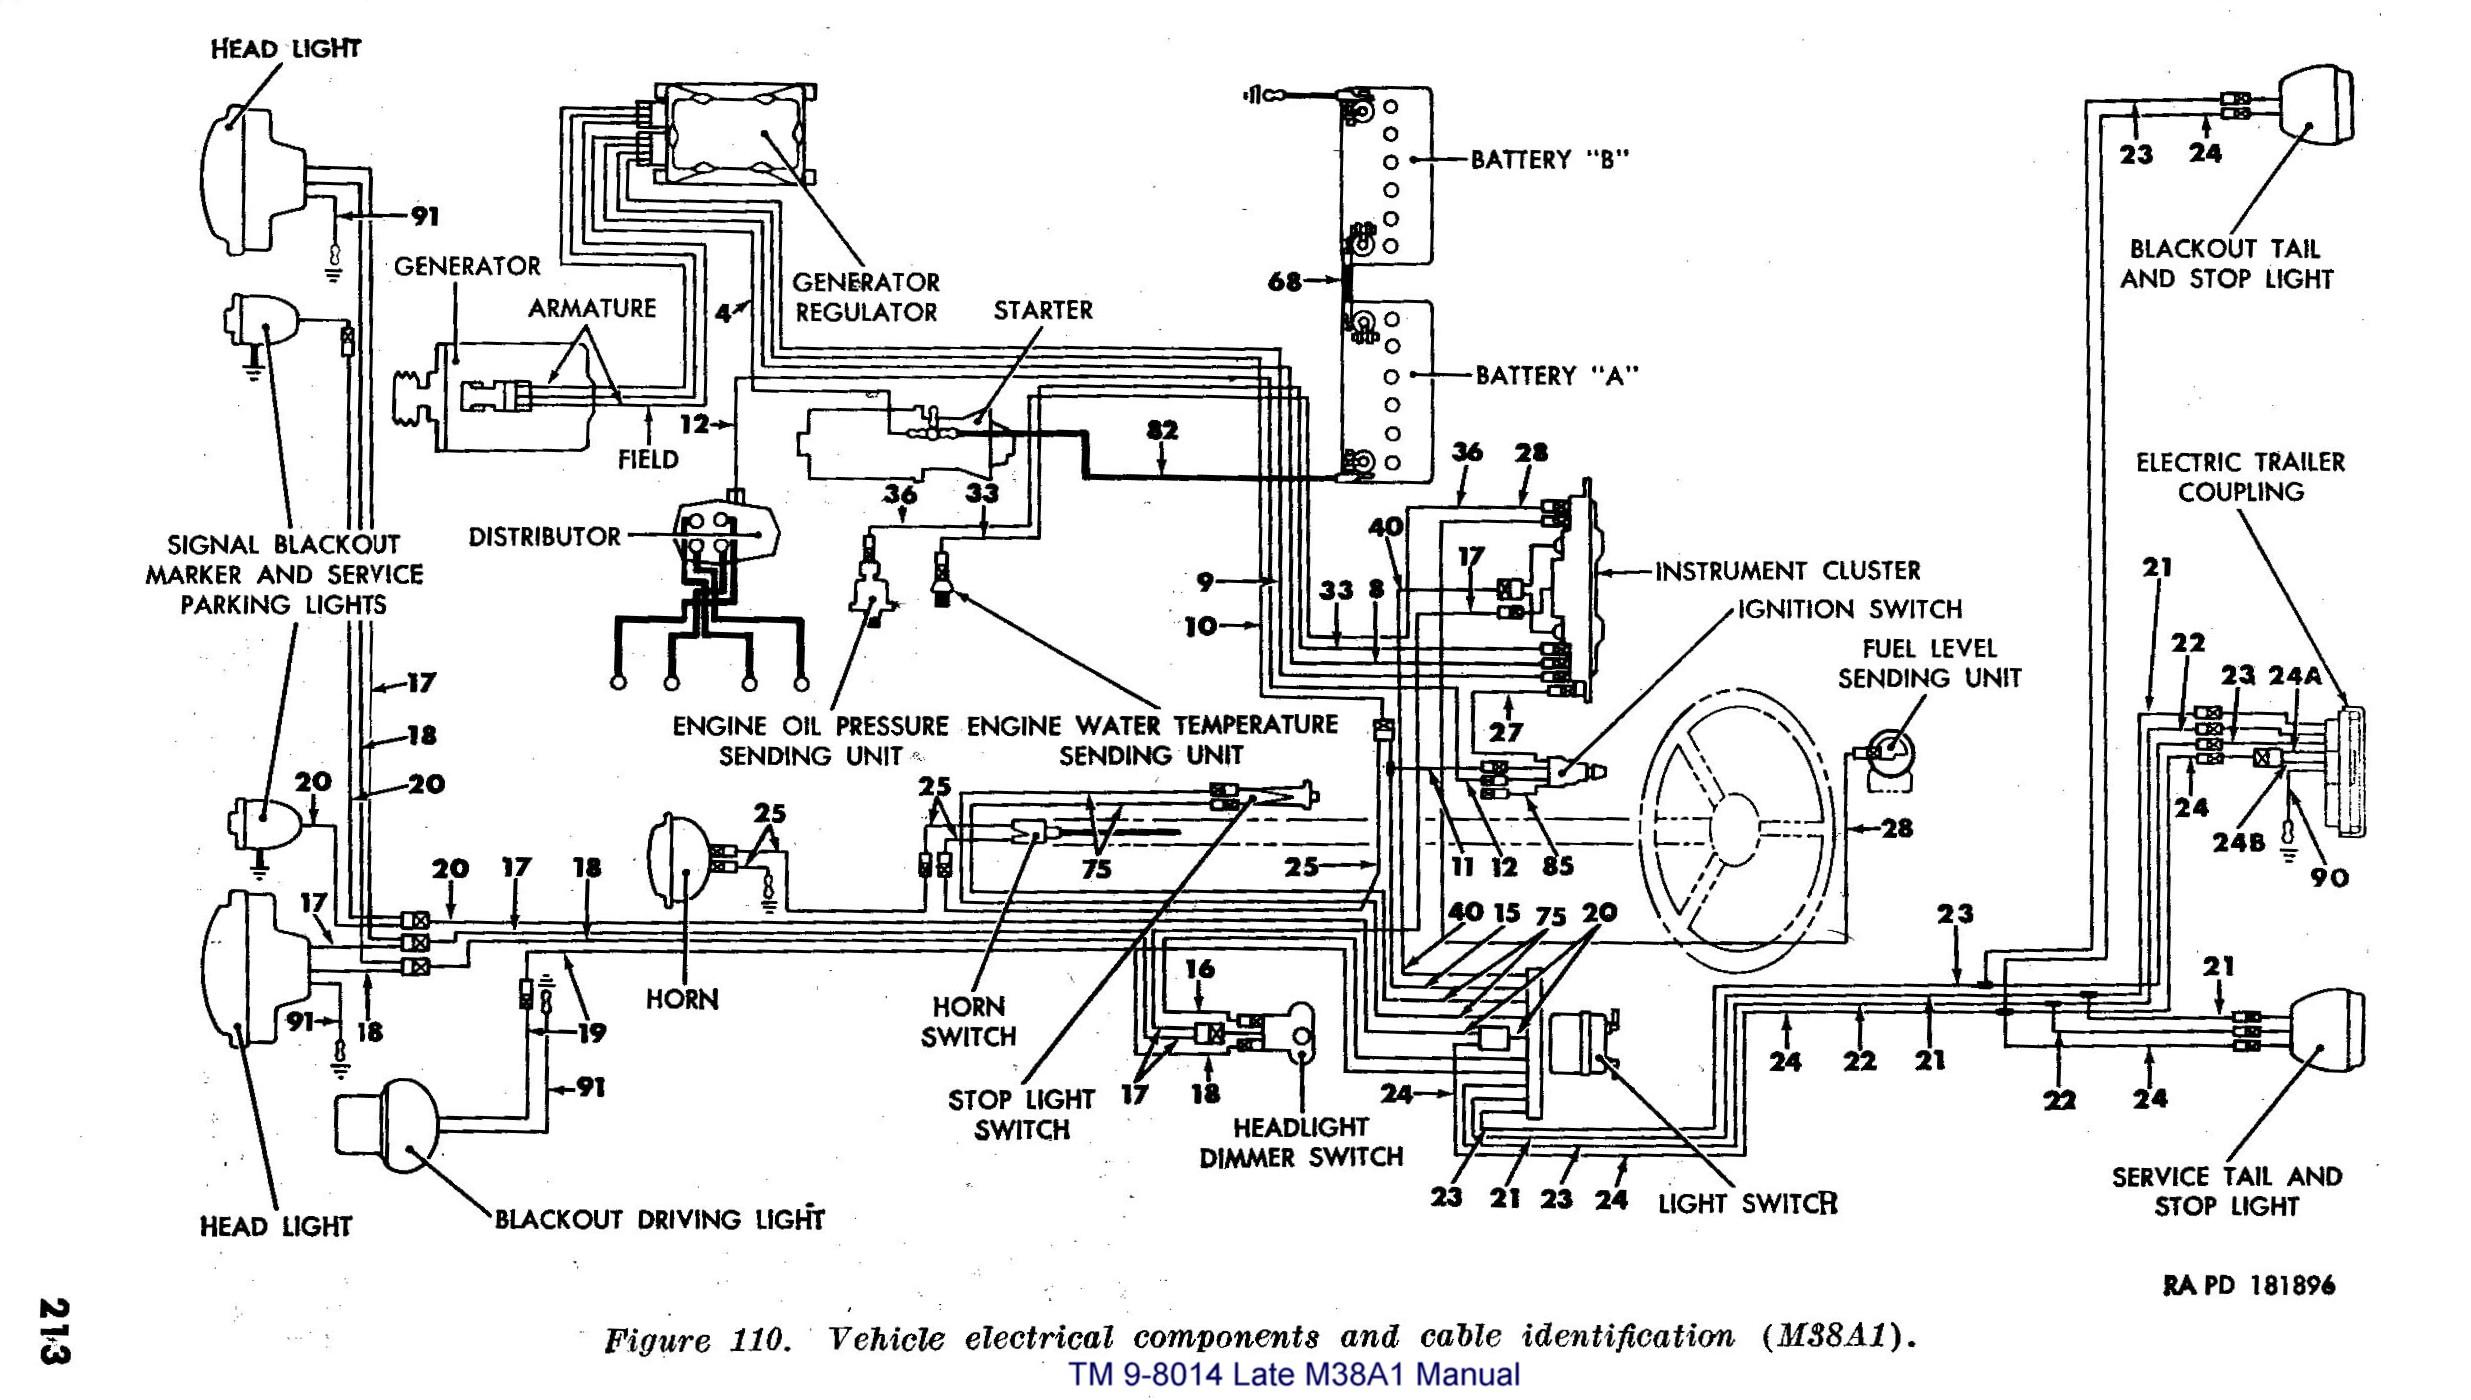 cj3 wiring diagram auto electrical wiring diagram electrical wiring cj3  wiring diagram